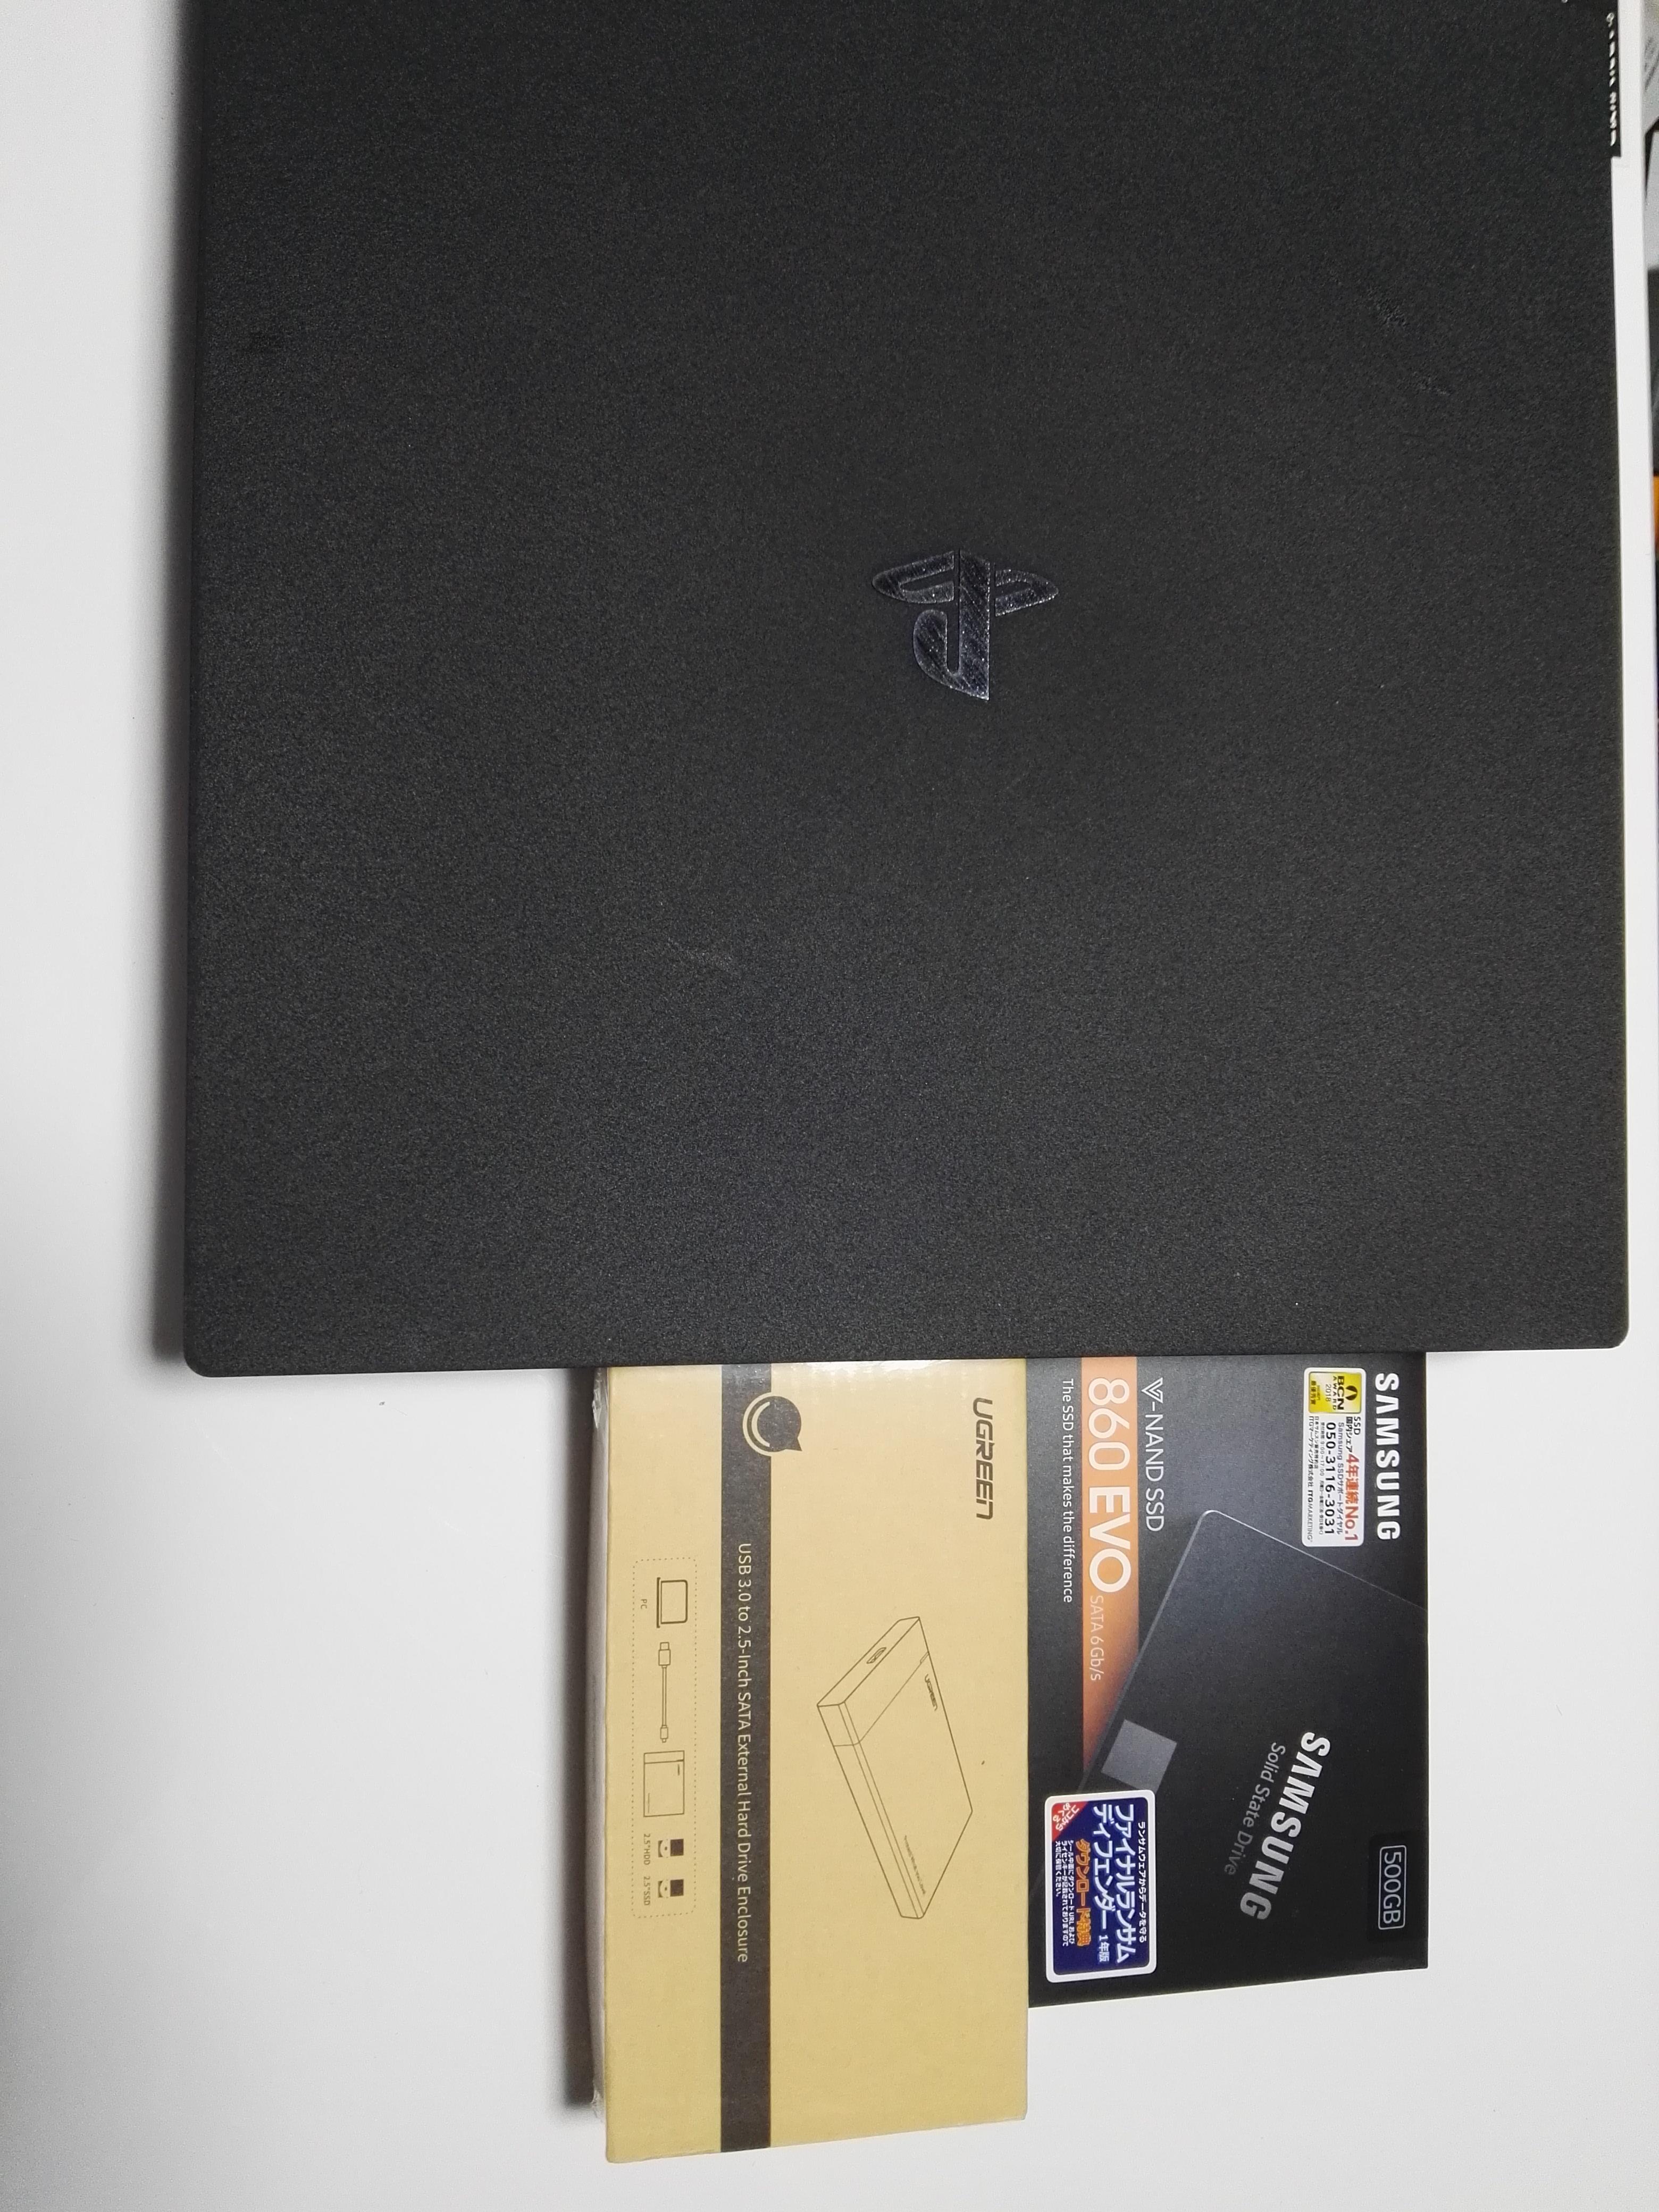 PS4 SSD 換装の手順